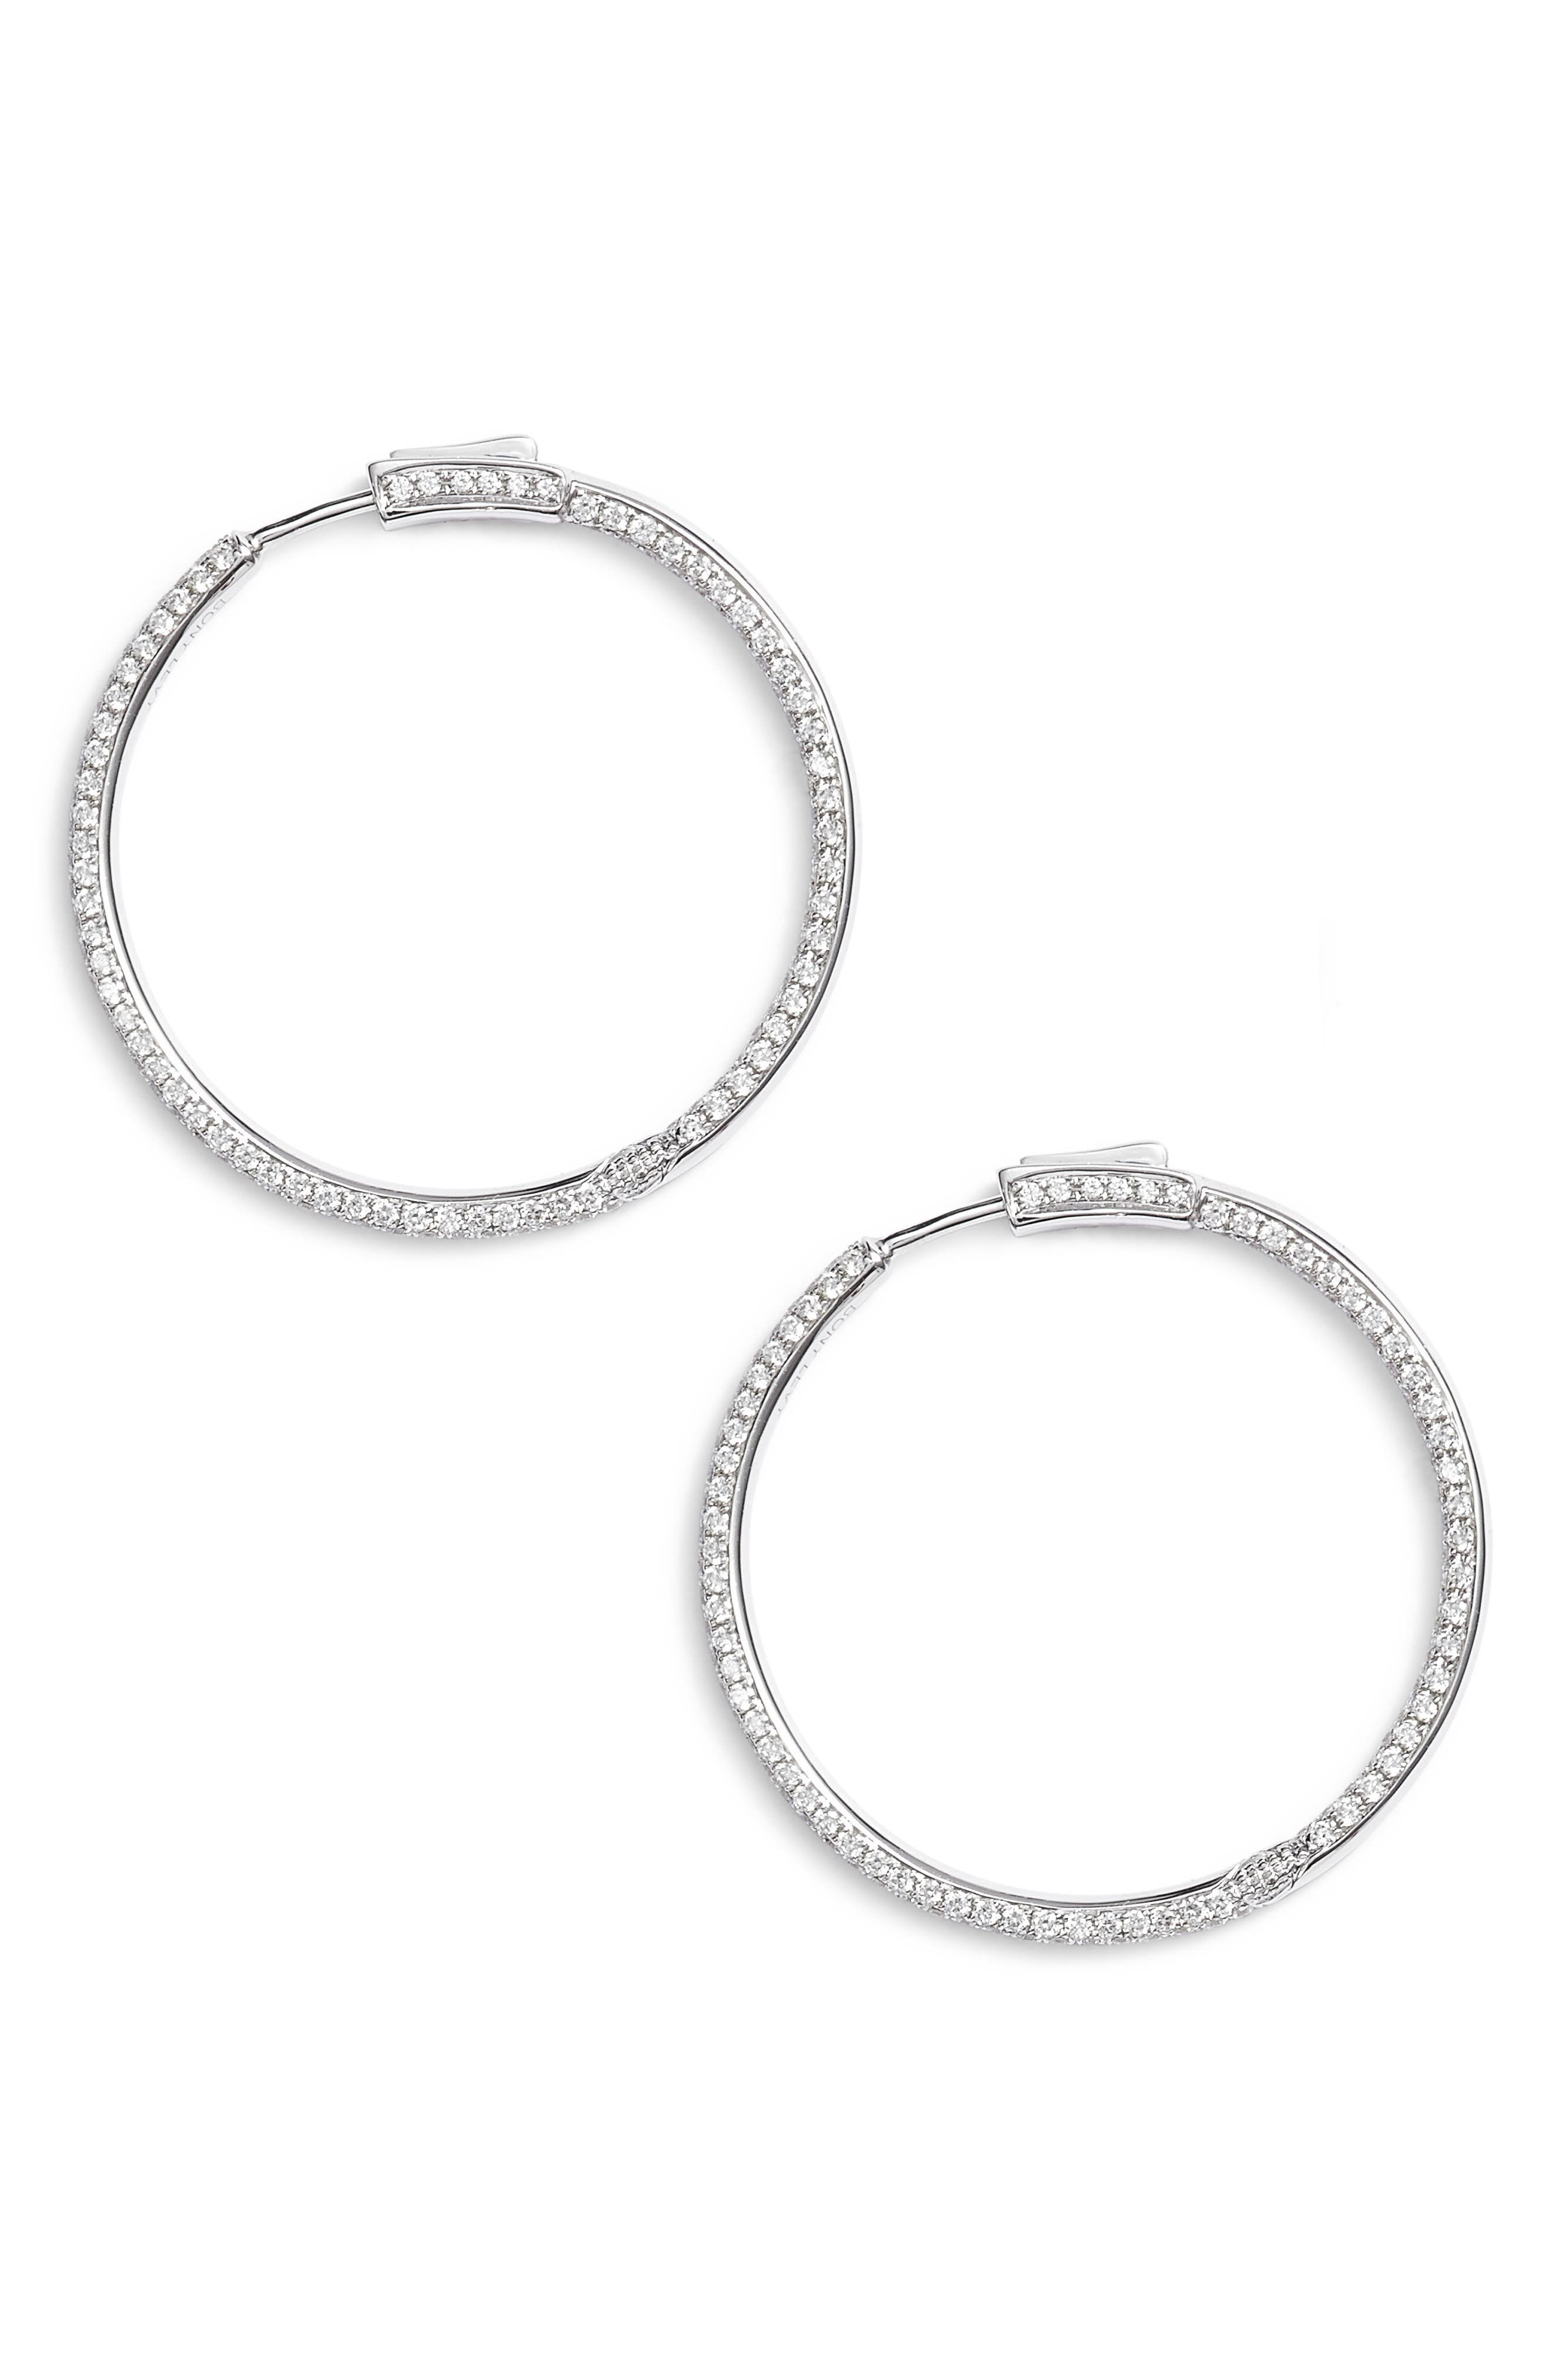 Inside Out Diamond Hoop Earrings,                         Main,                         color, White Gold